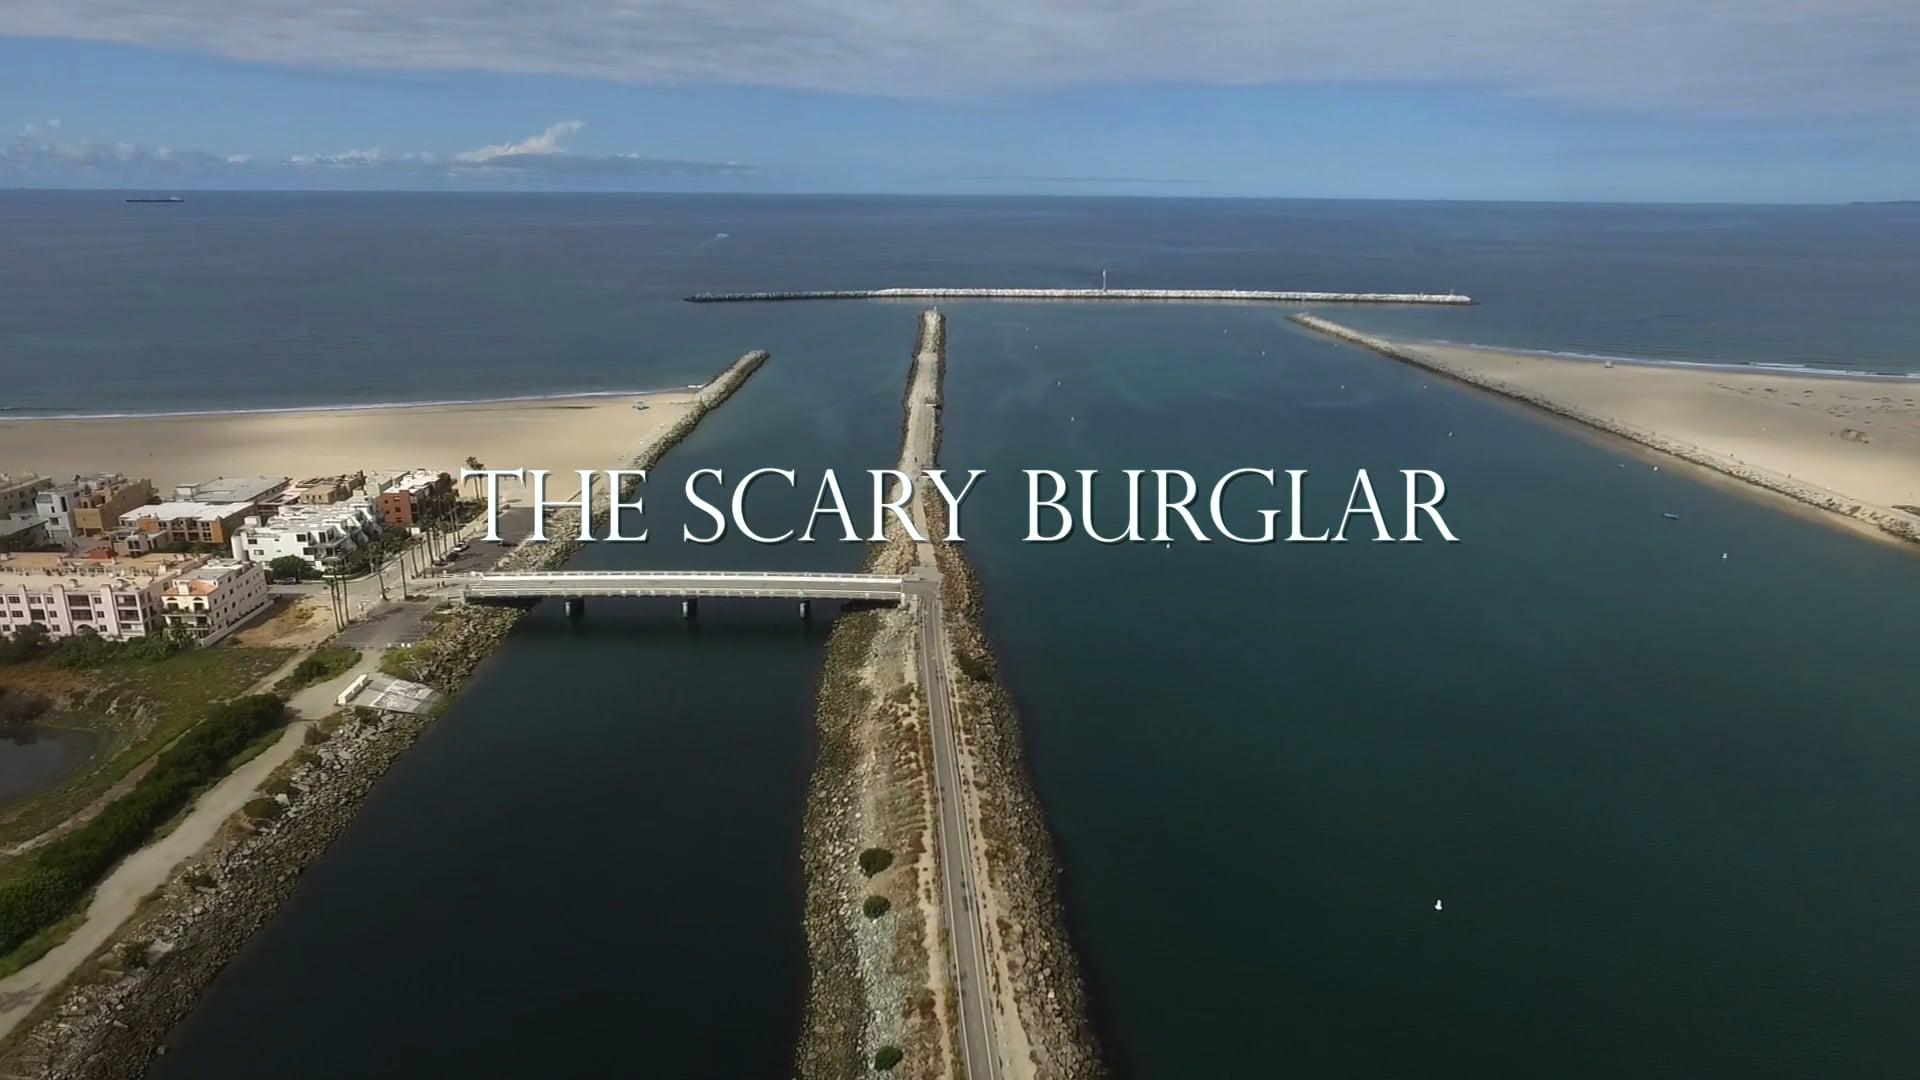 The Scary Burglar (opening credits)